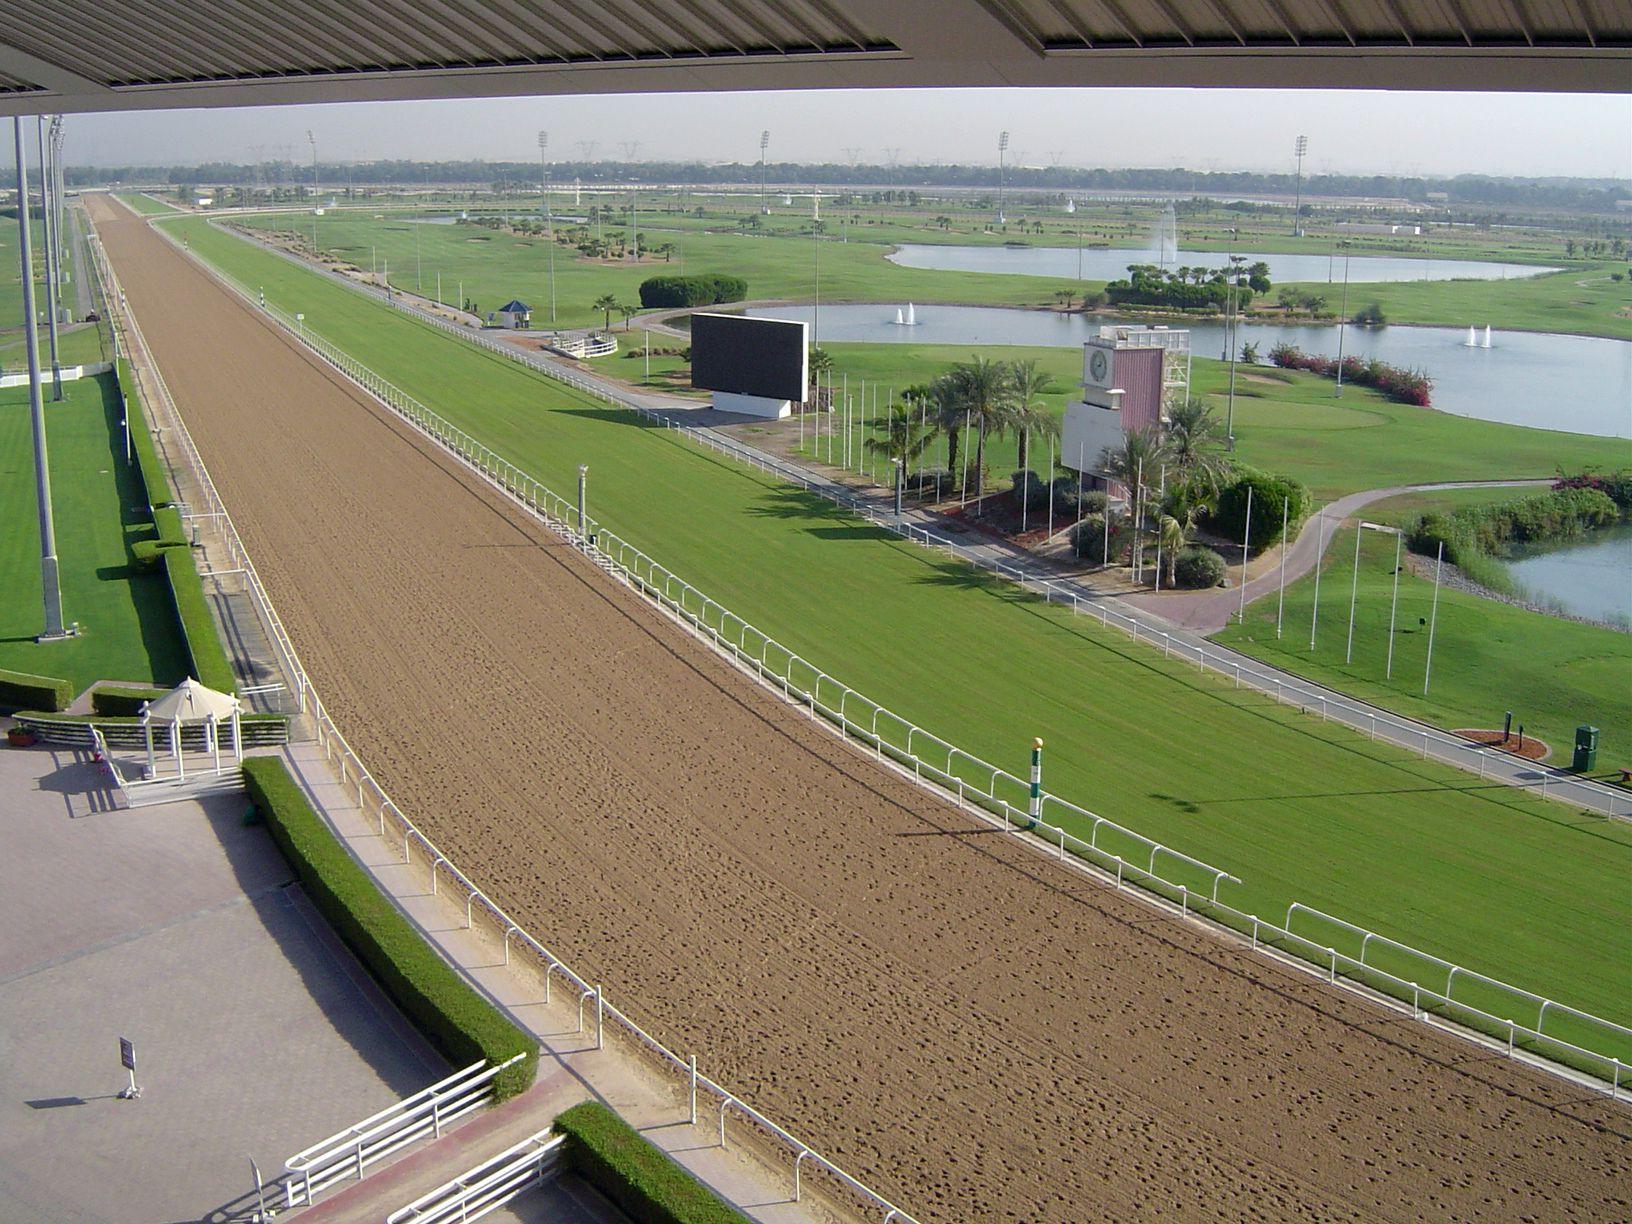 Dubai Horse Tracks